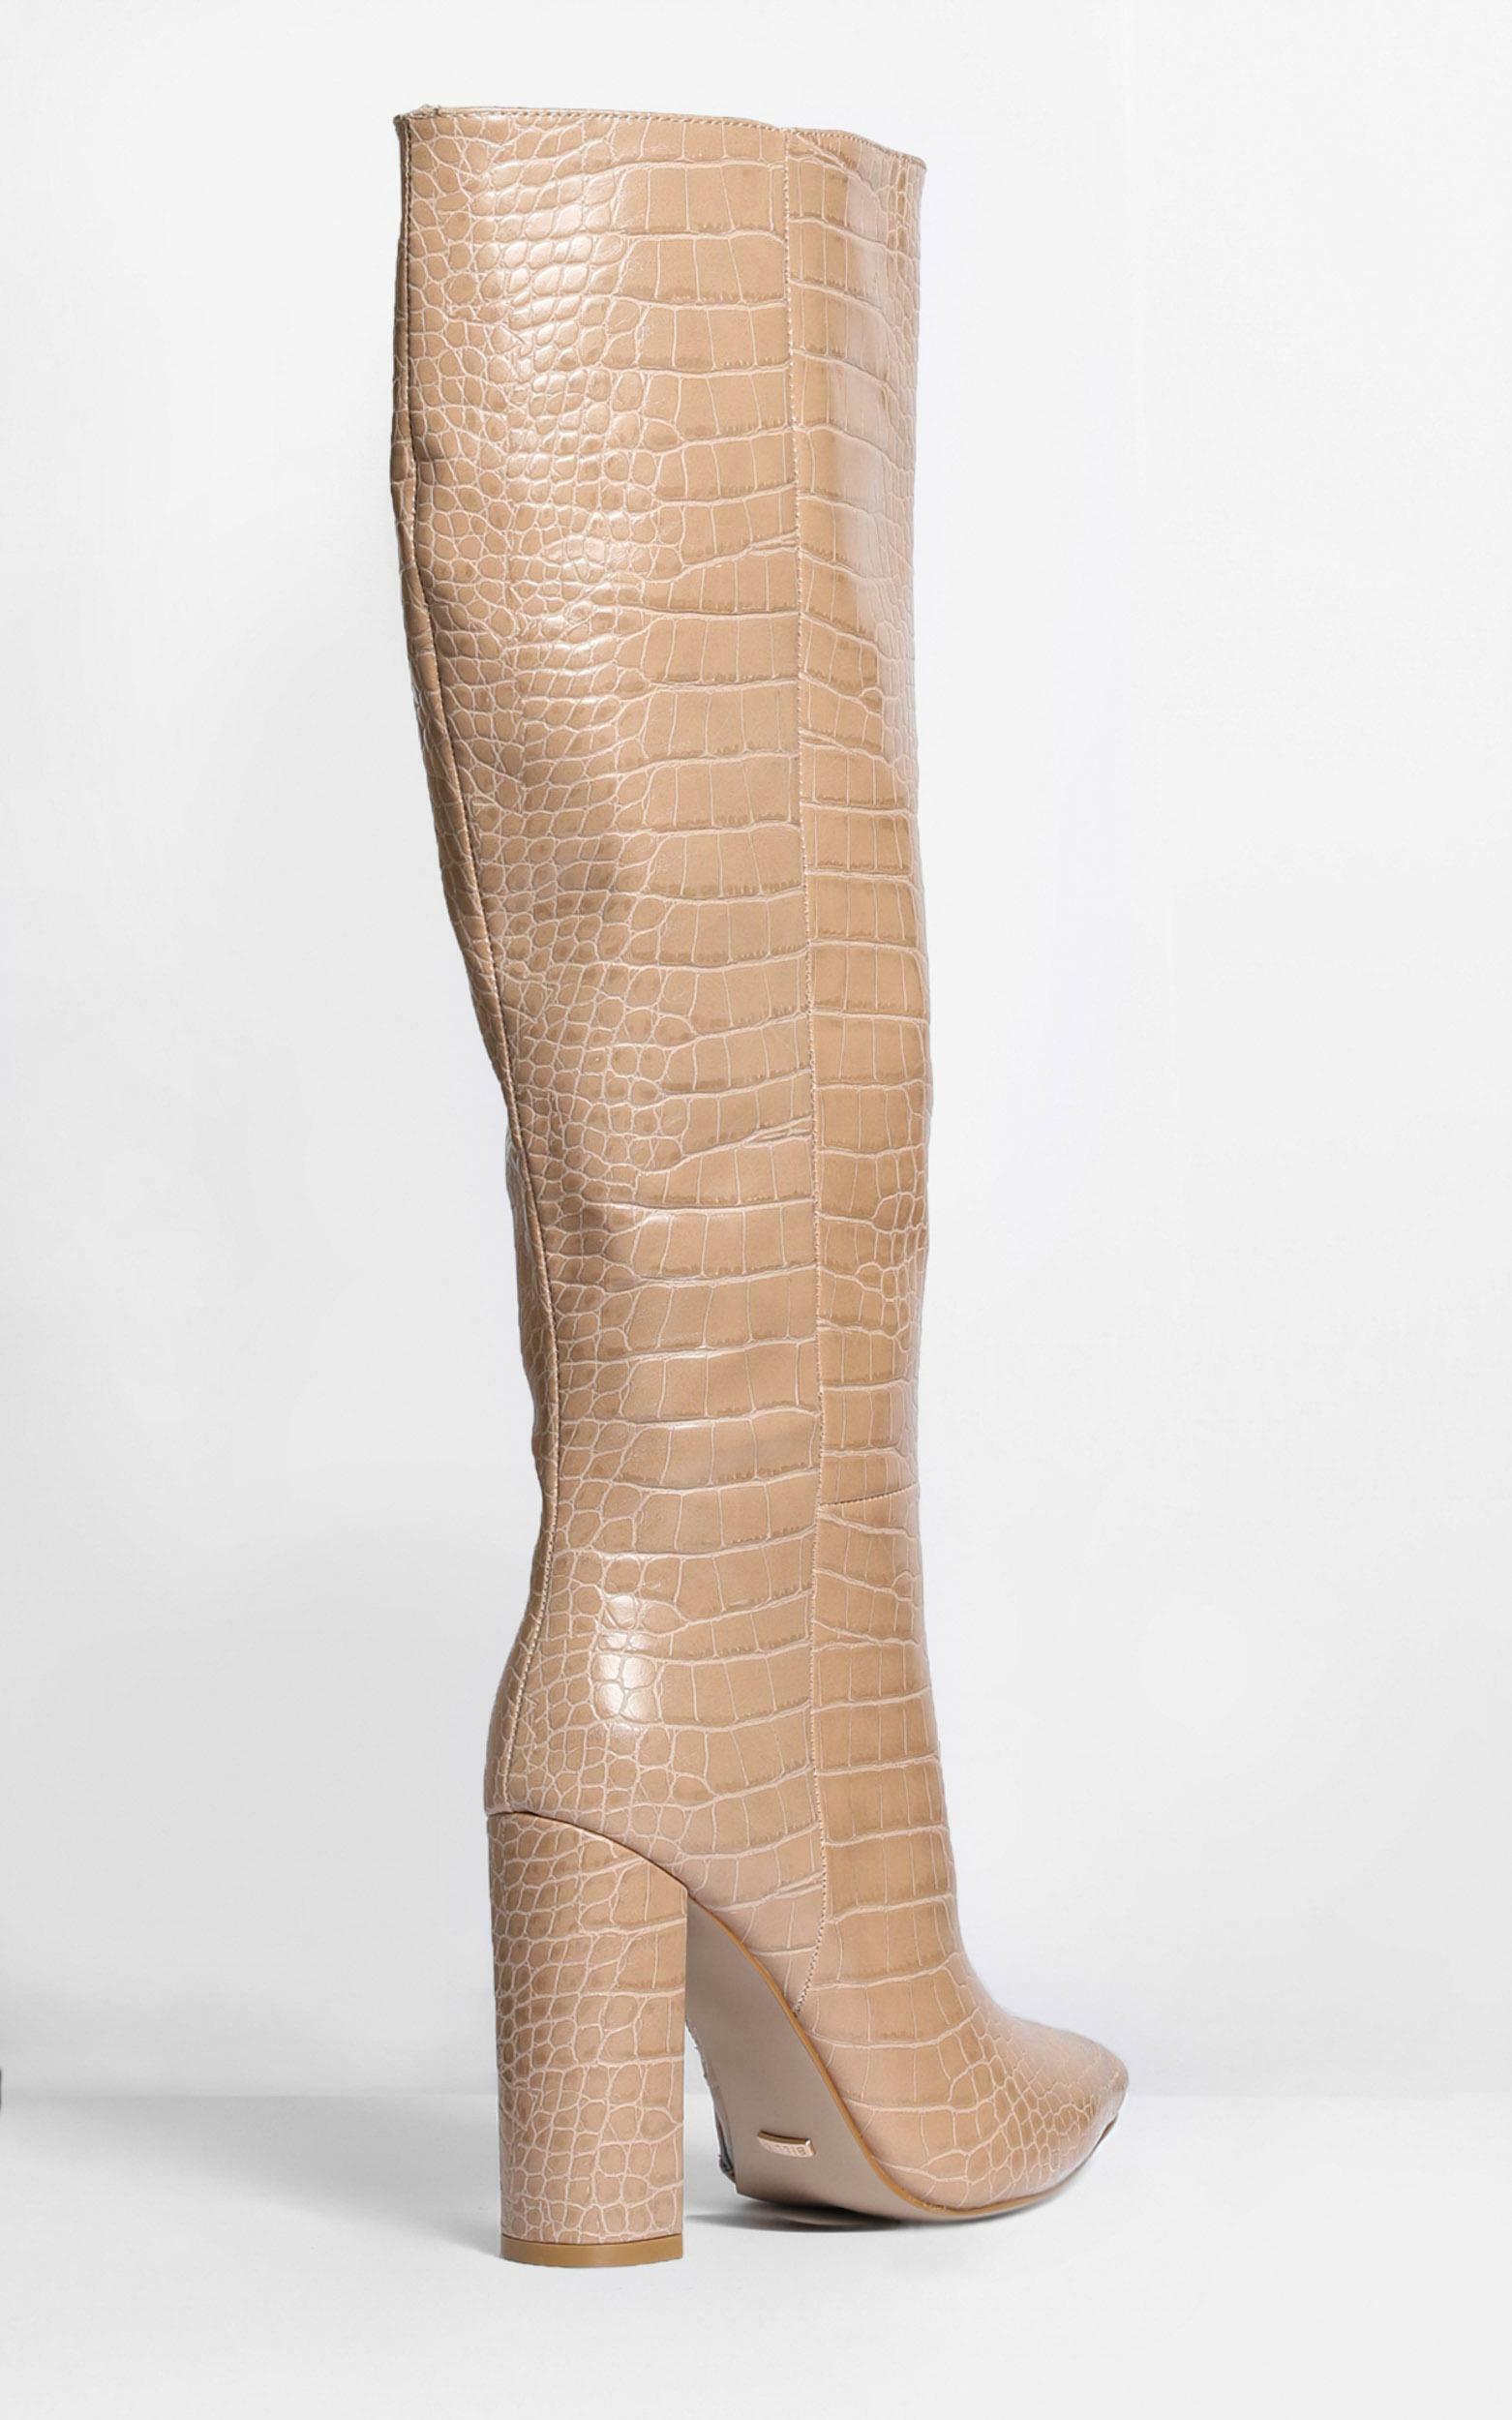 Billini - Milla Boots in nude croc - 5, Beige, hi-res image number null